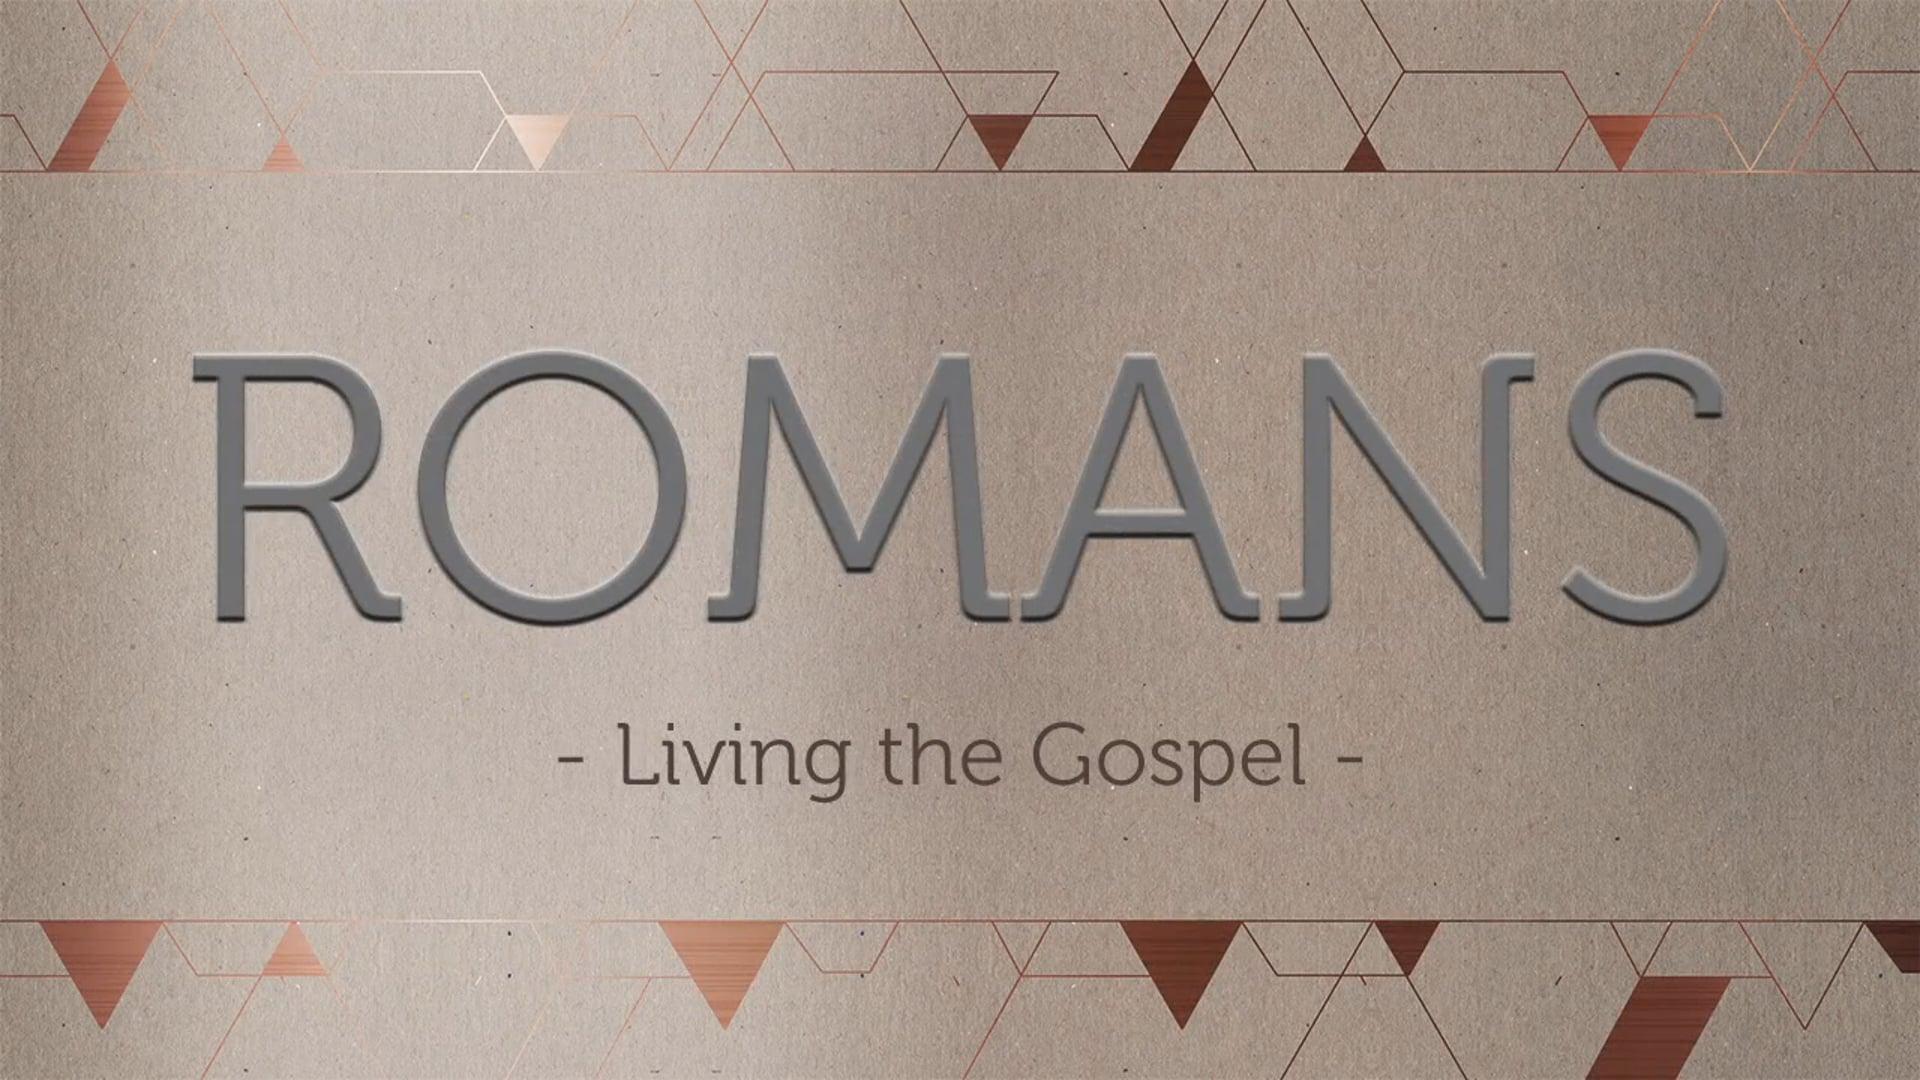 Week 5: Live as Citizens - Romans 13